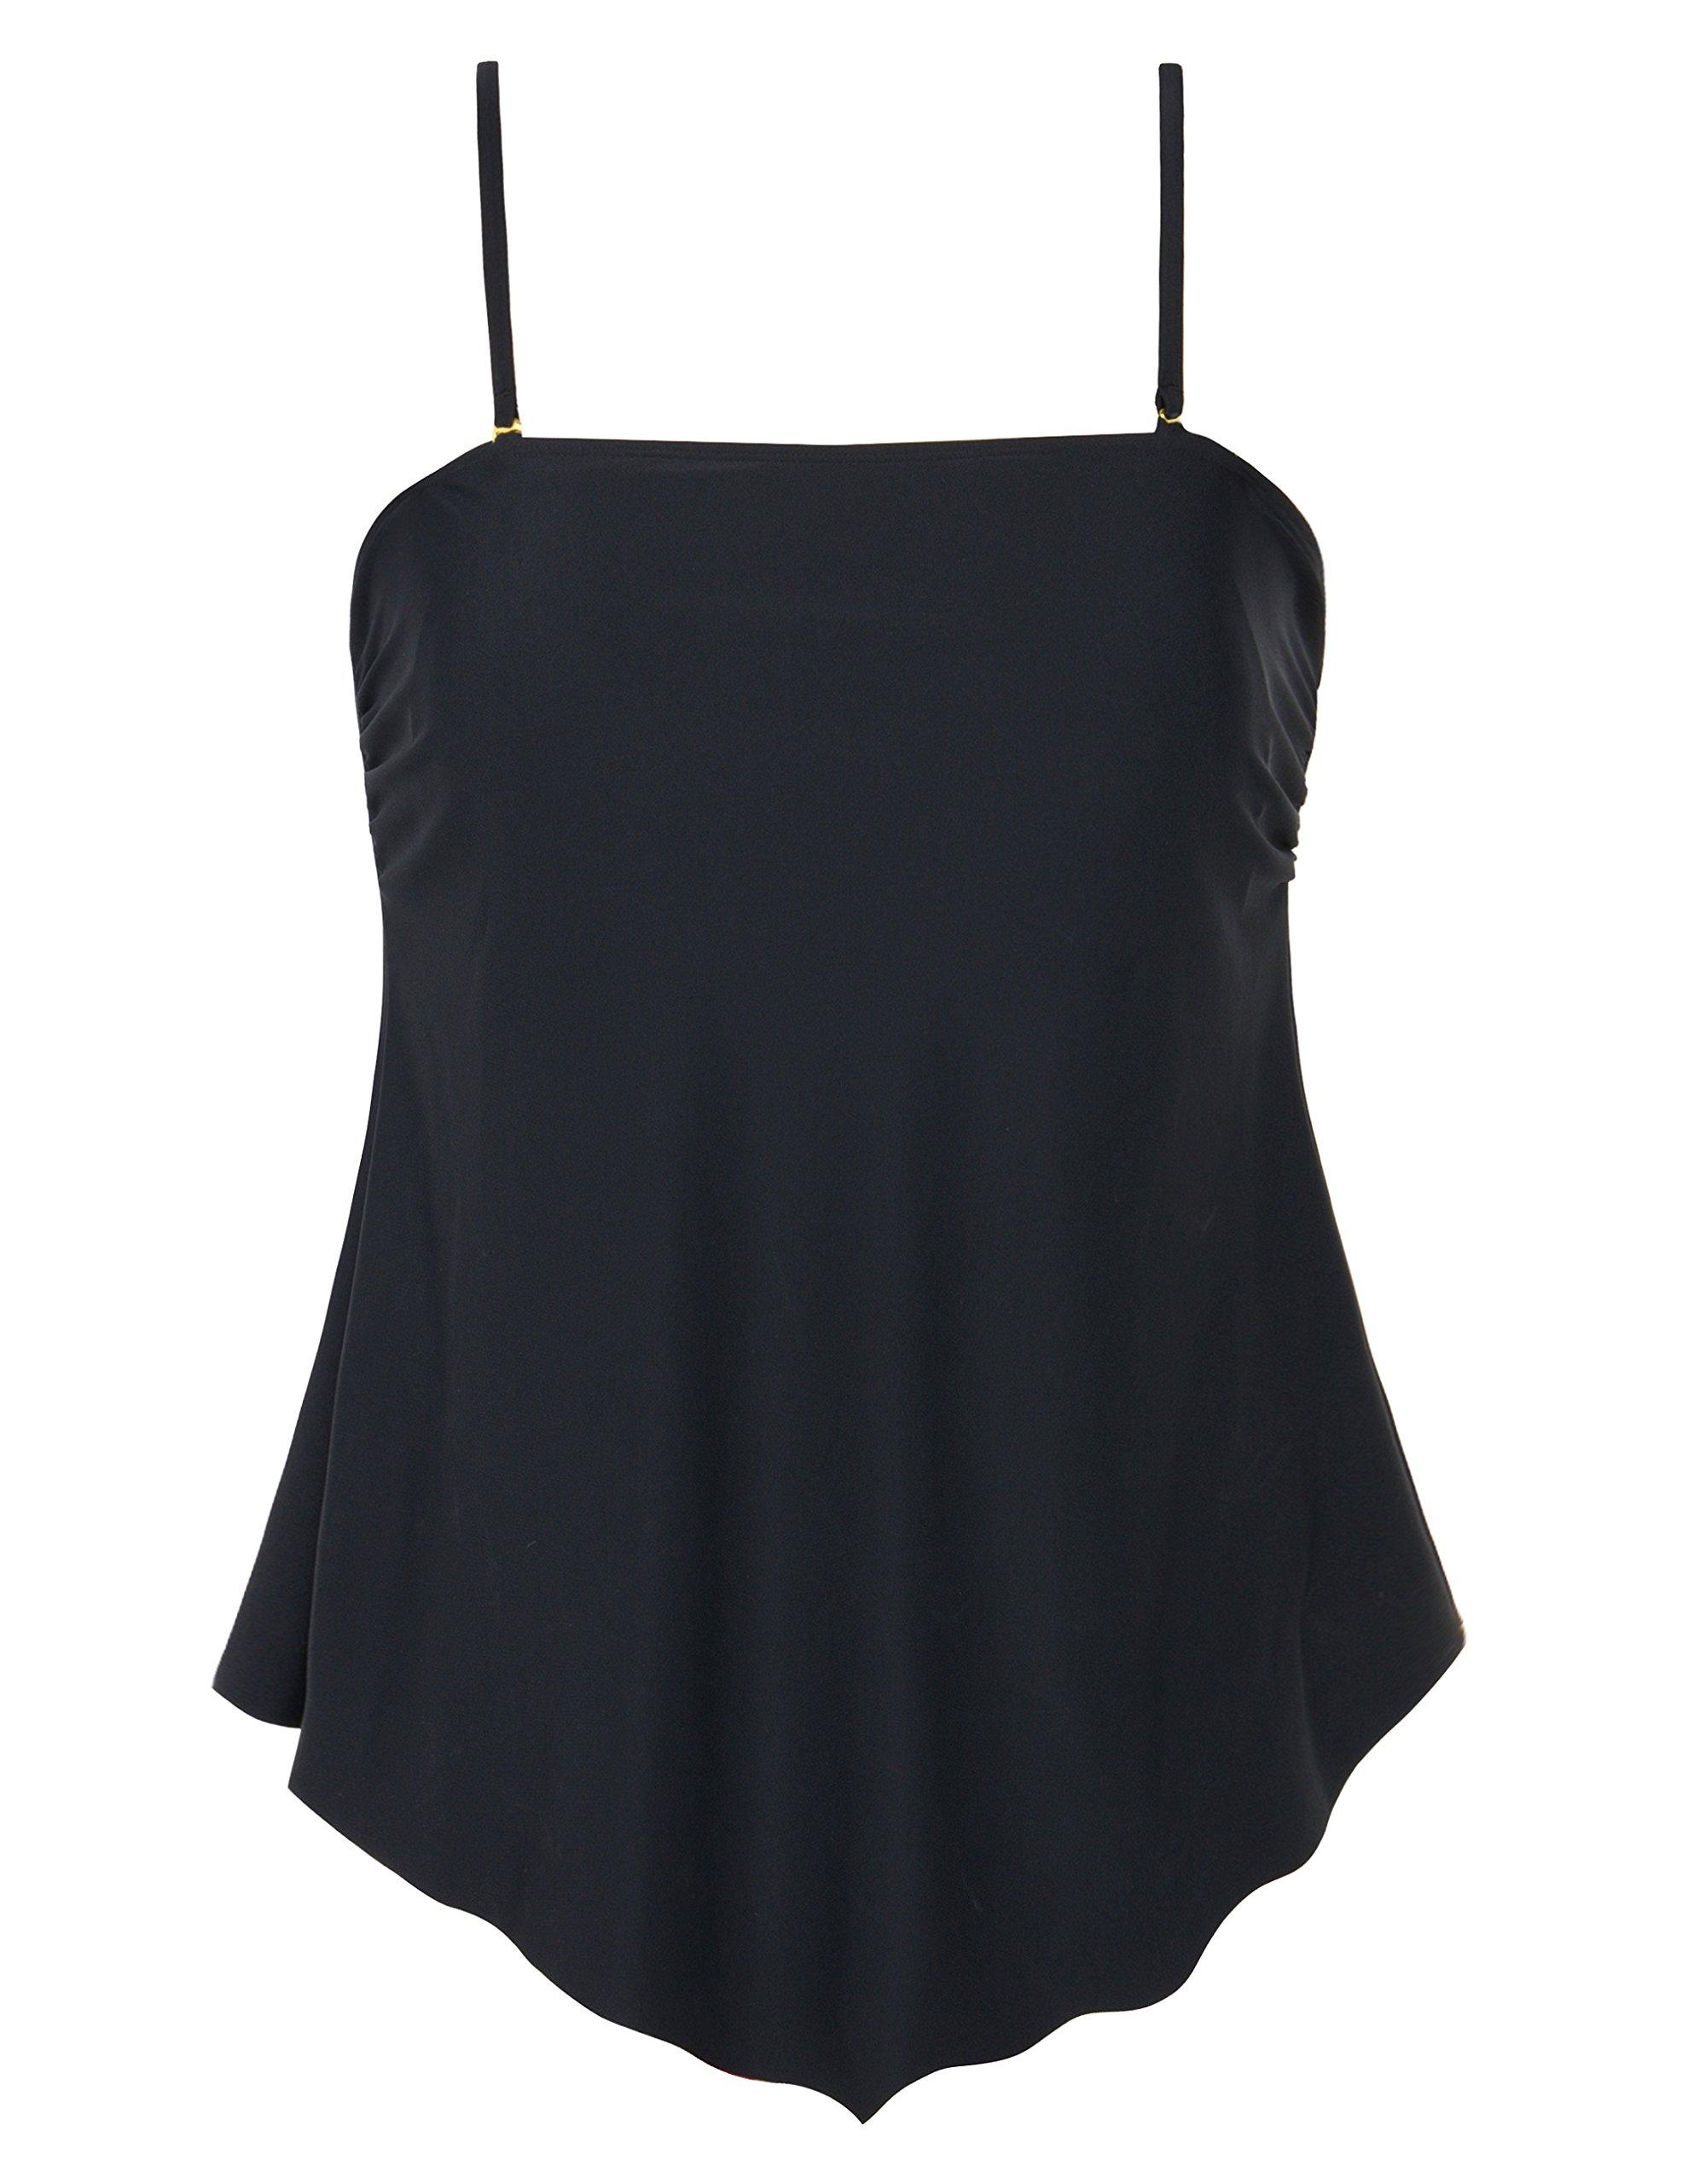 Mycoco Women's Flowy Swimsuit Solid Bandeau Tankini Top Irregular Hemline Swim Top Black 8